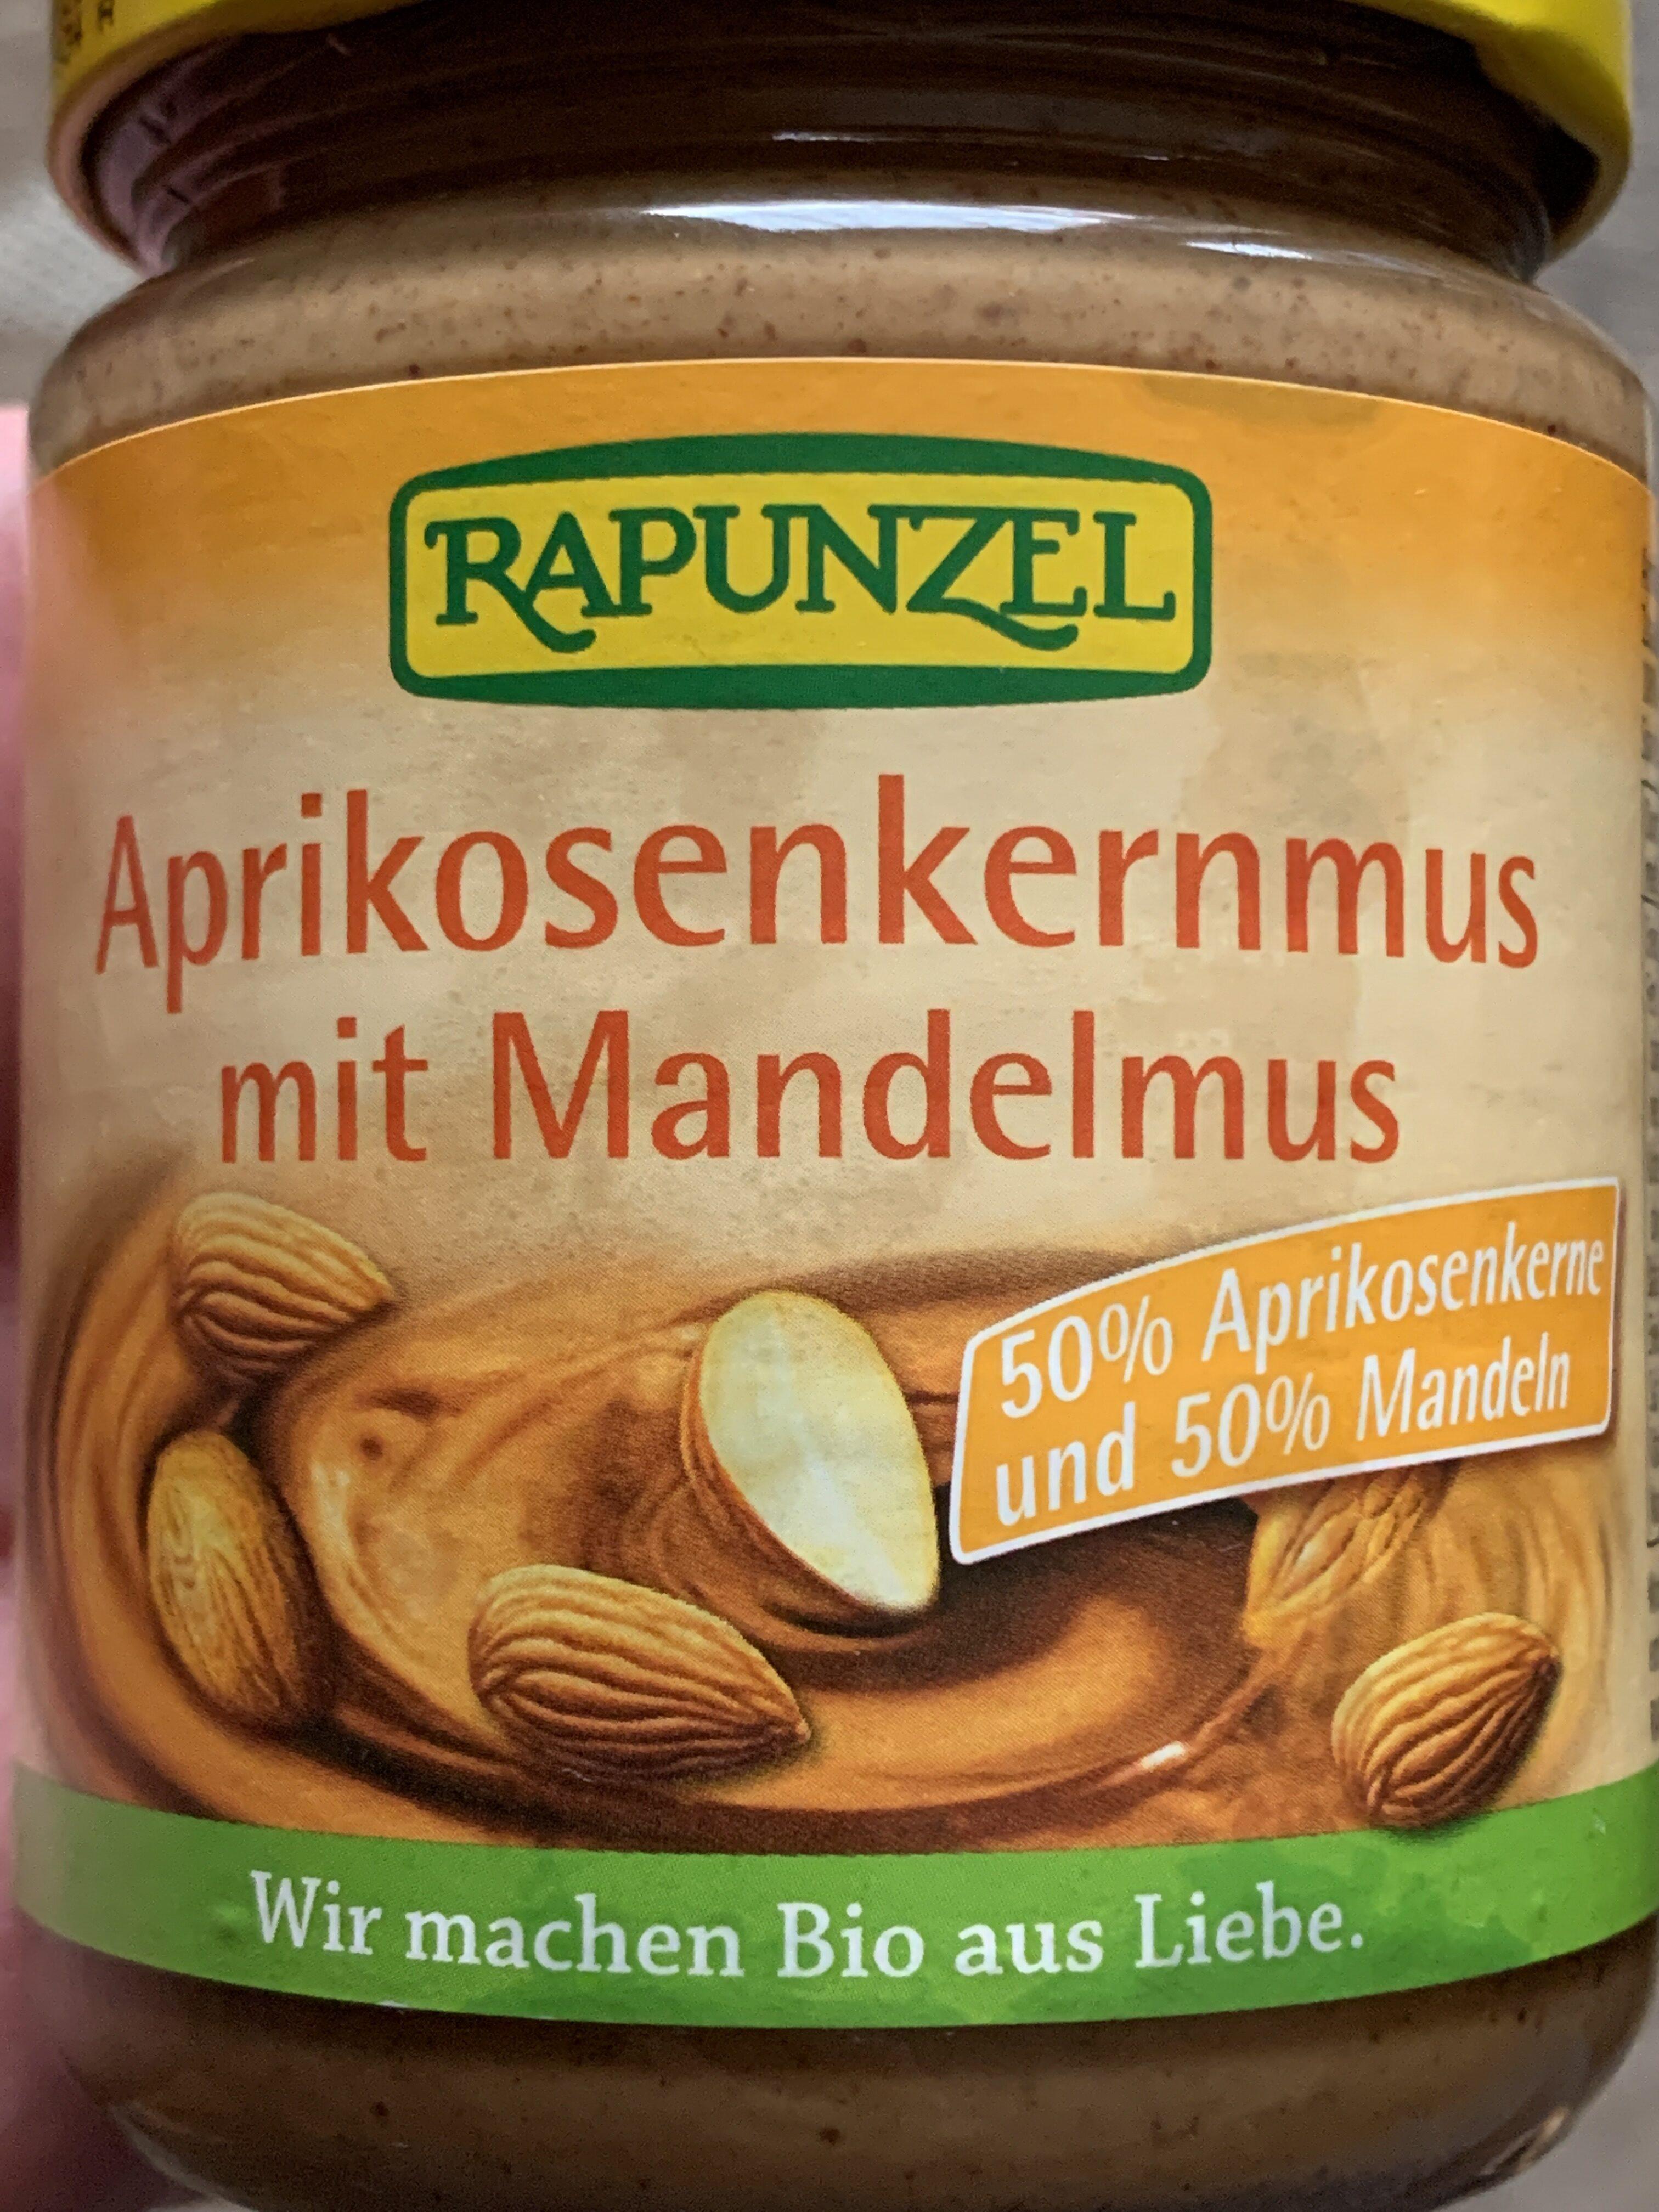 Aprikosenkernmus mit Mandelmus - Produit - de